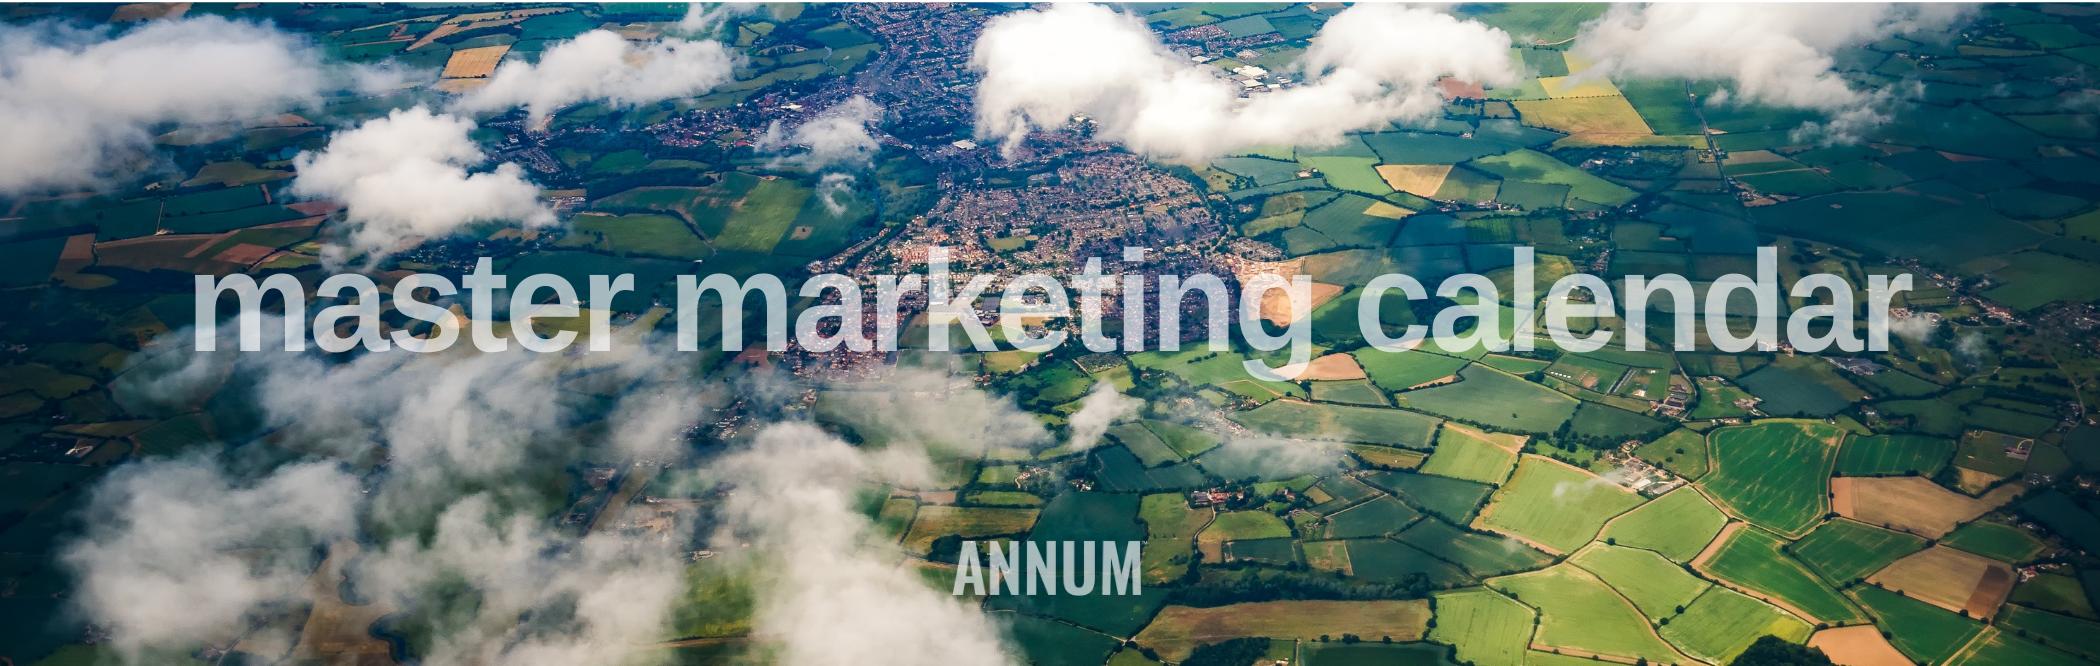 Annum master marketing calendar software